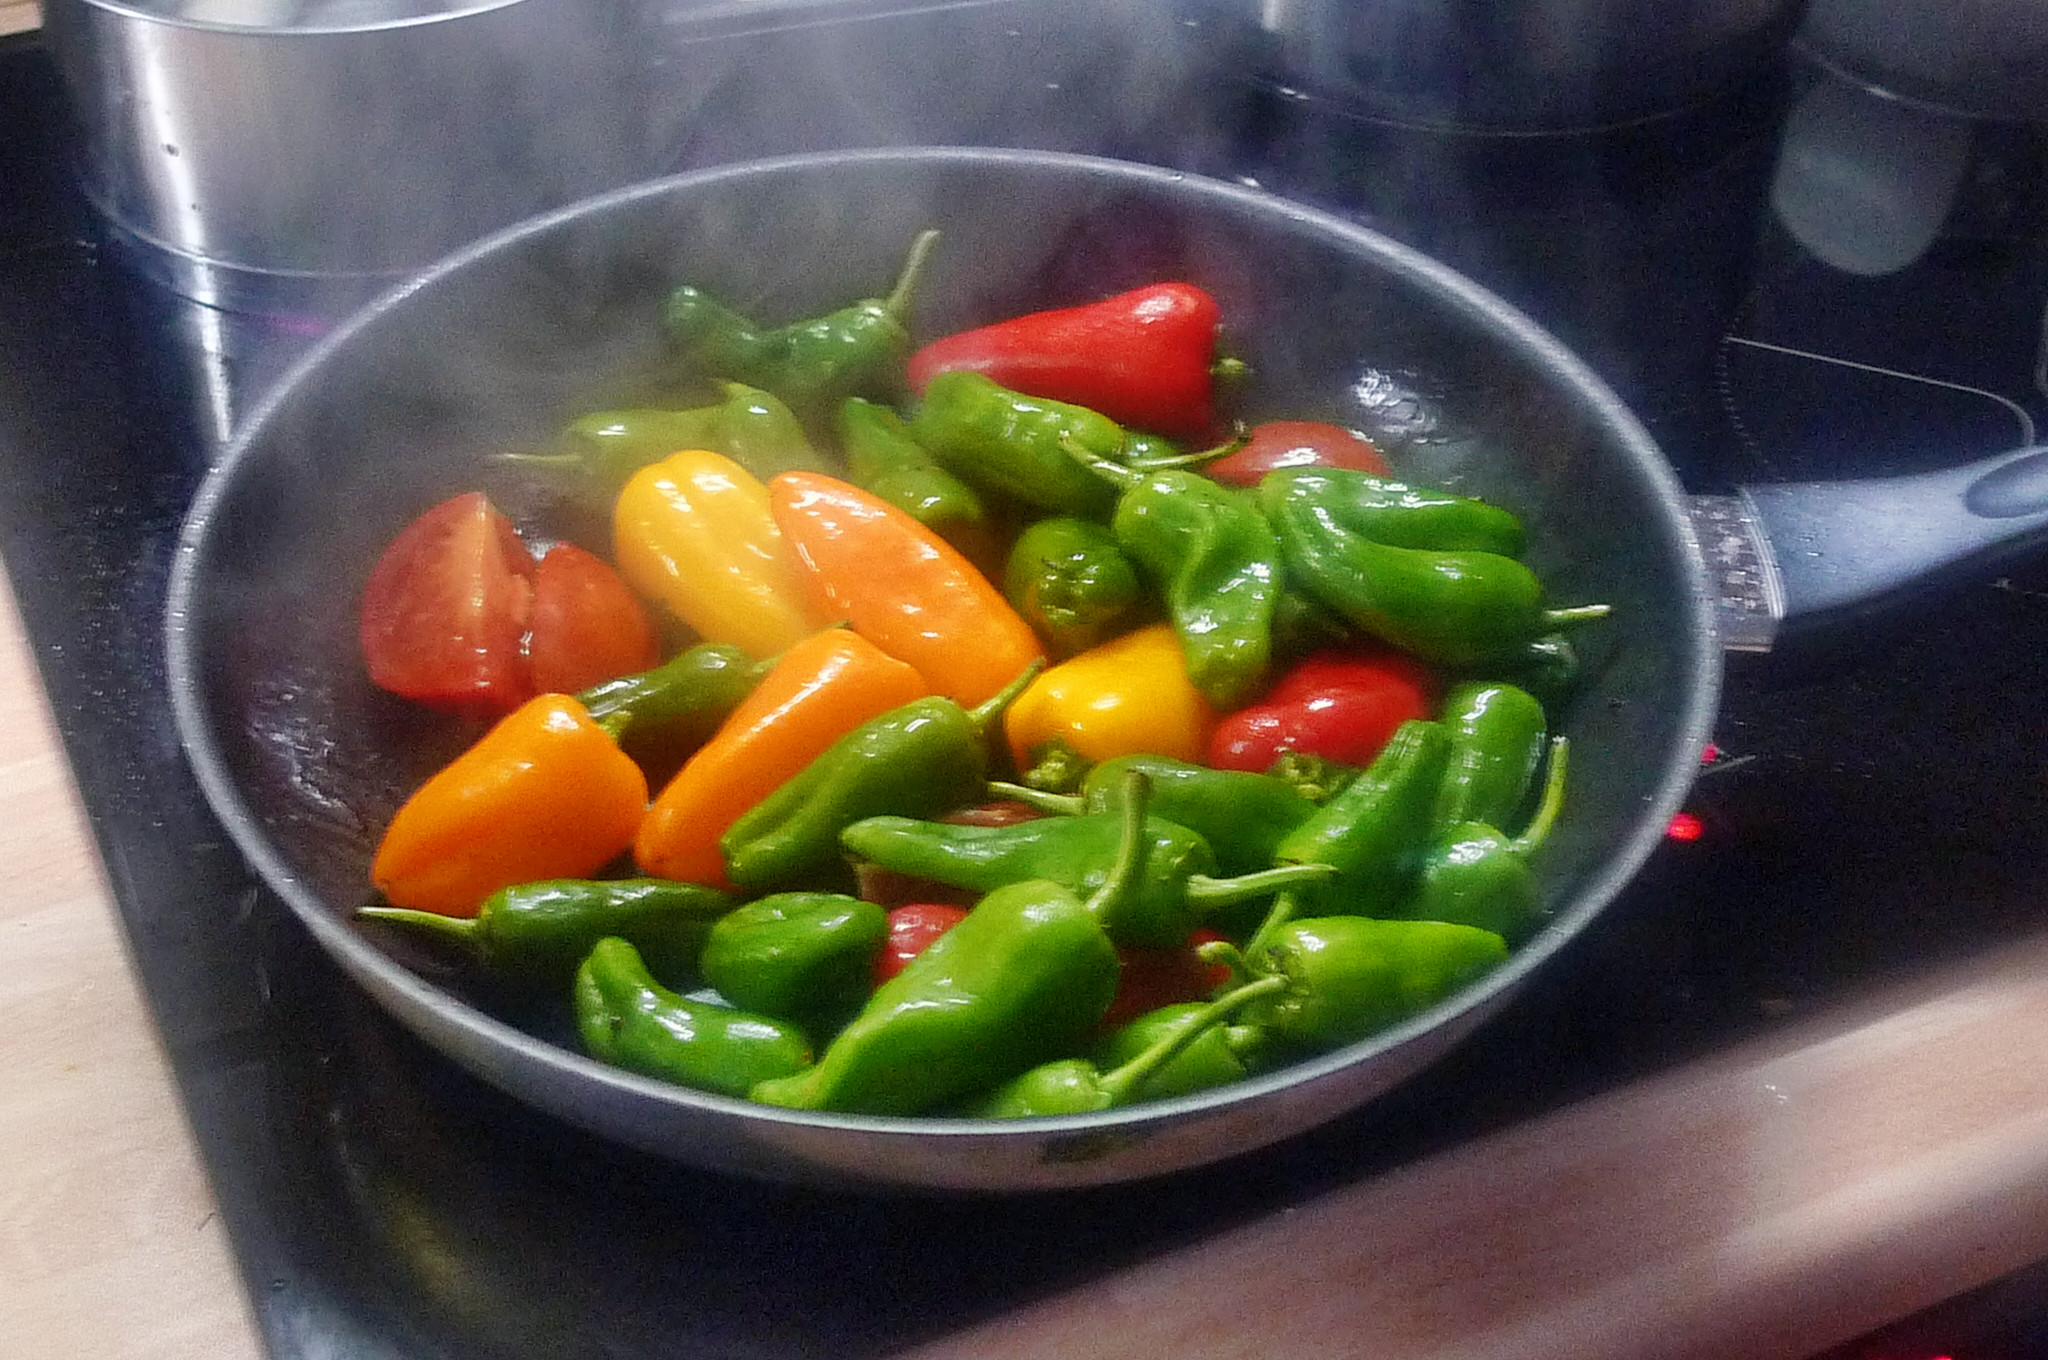 Pimentos-Paprika-Kartoffel-Salat-Buttermilch- 28.9.14   (4)